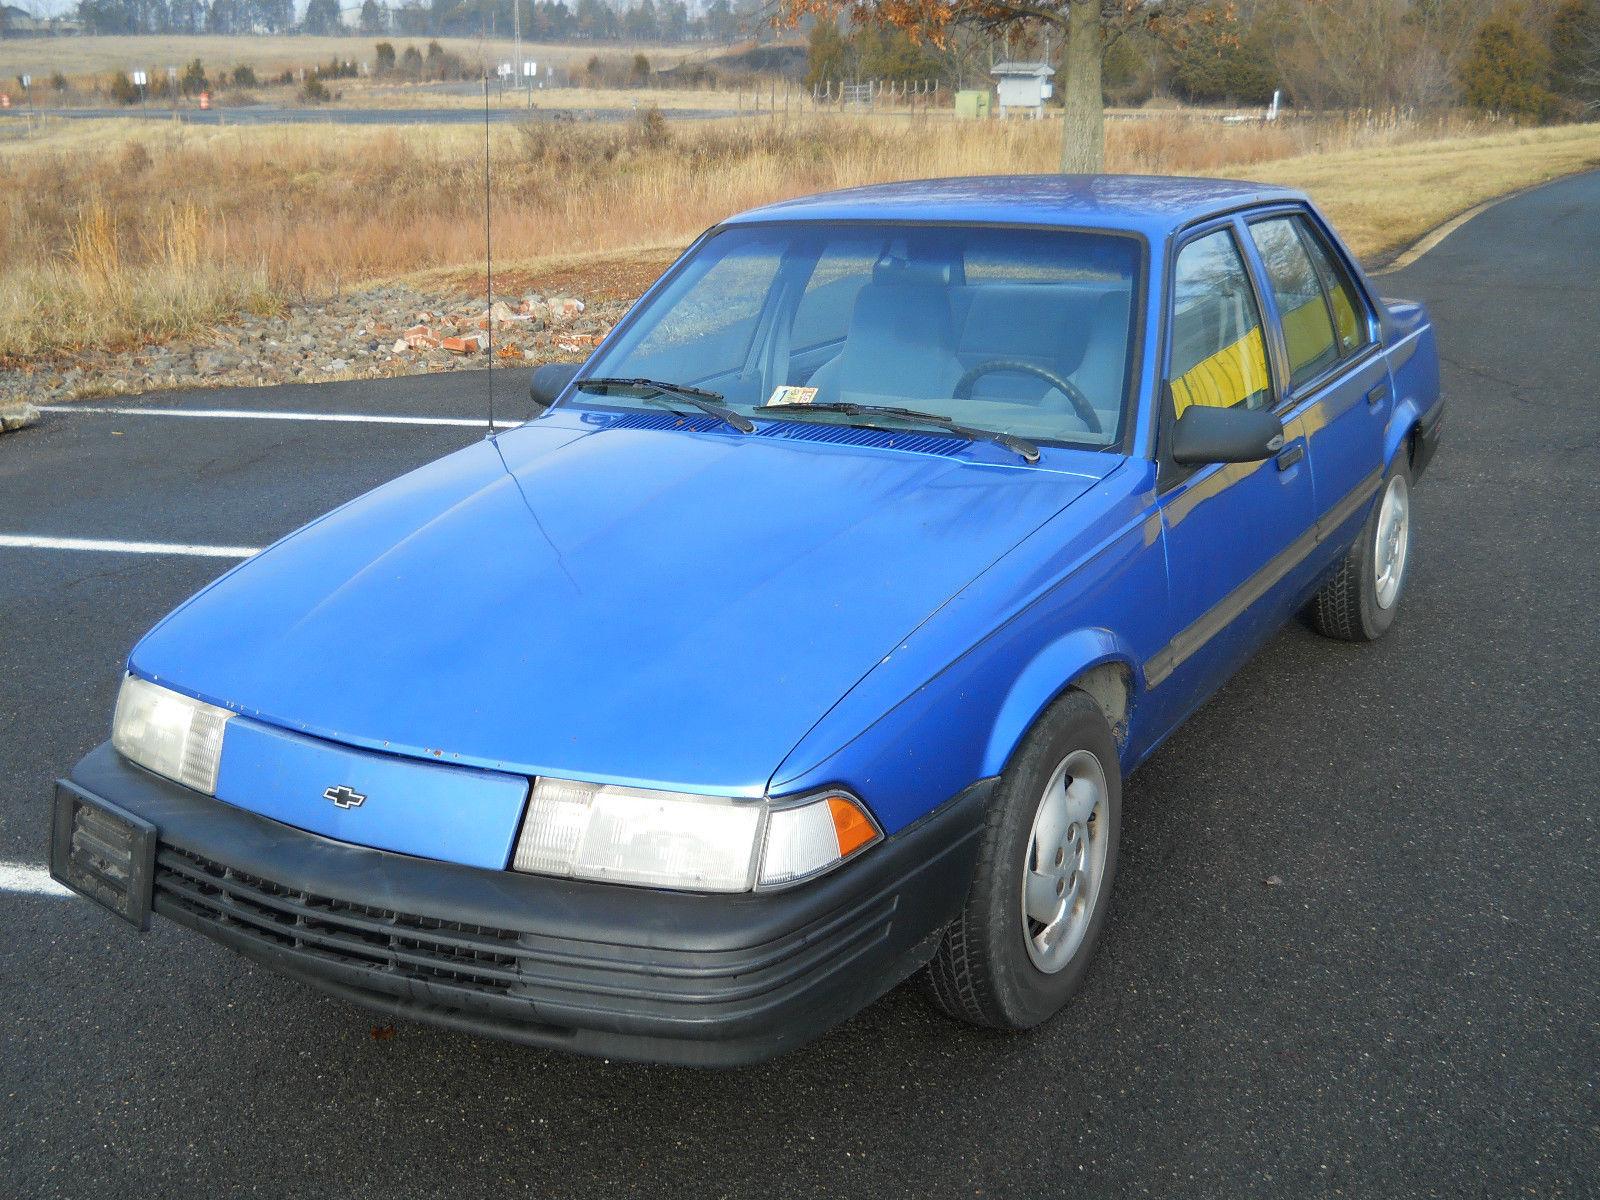 1994 Chevrolet Cavalier VL Sedan 4-Door 2.2L Automatic ...